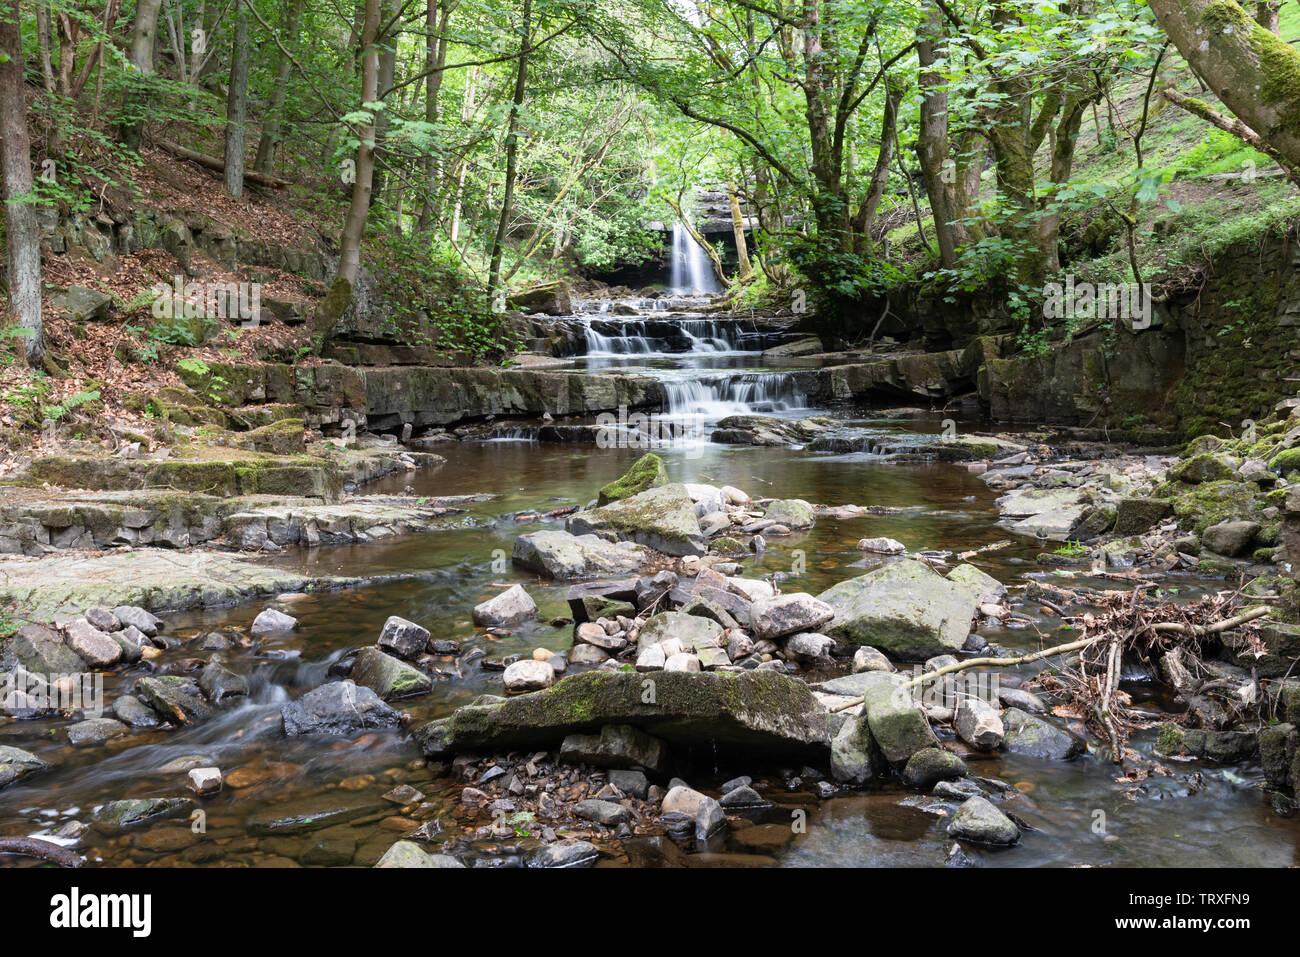 Summerhill Force at Bowlees - Stock Image